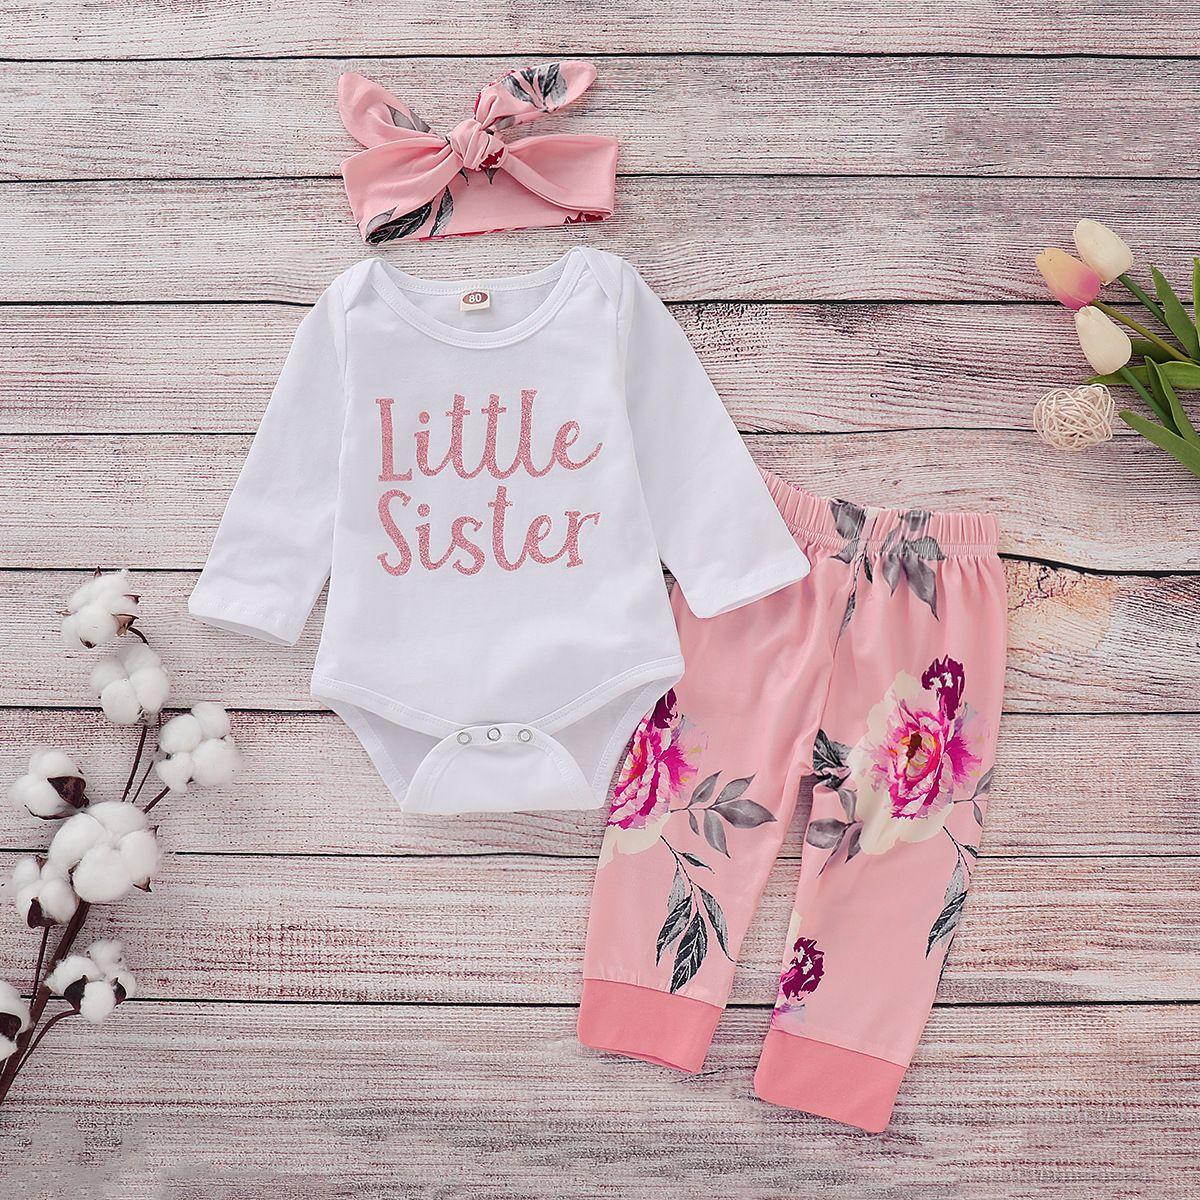 3Pc Newborn Baby Girl Clothes Short Sleeve Ruffled Romper Shirt Floral Shorts Pants Headband Outfit Set